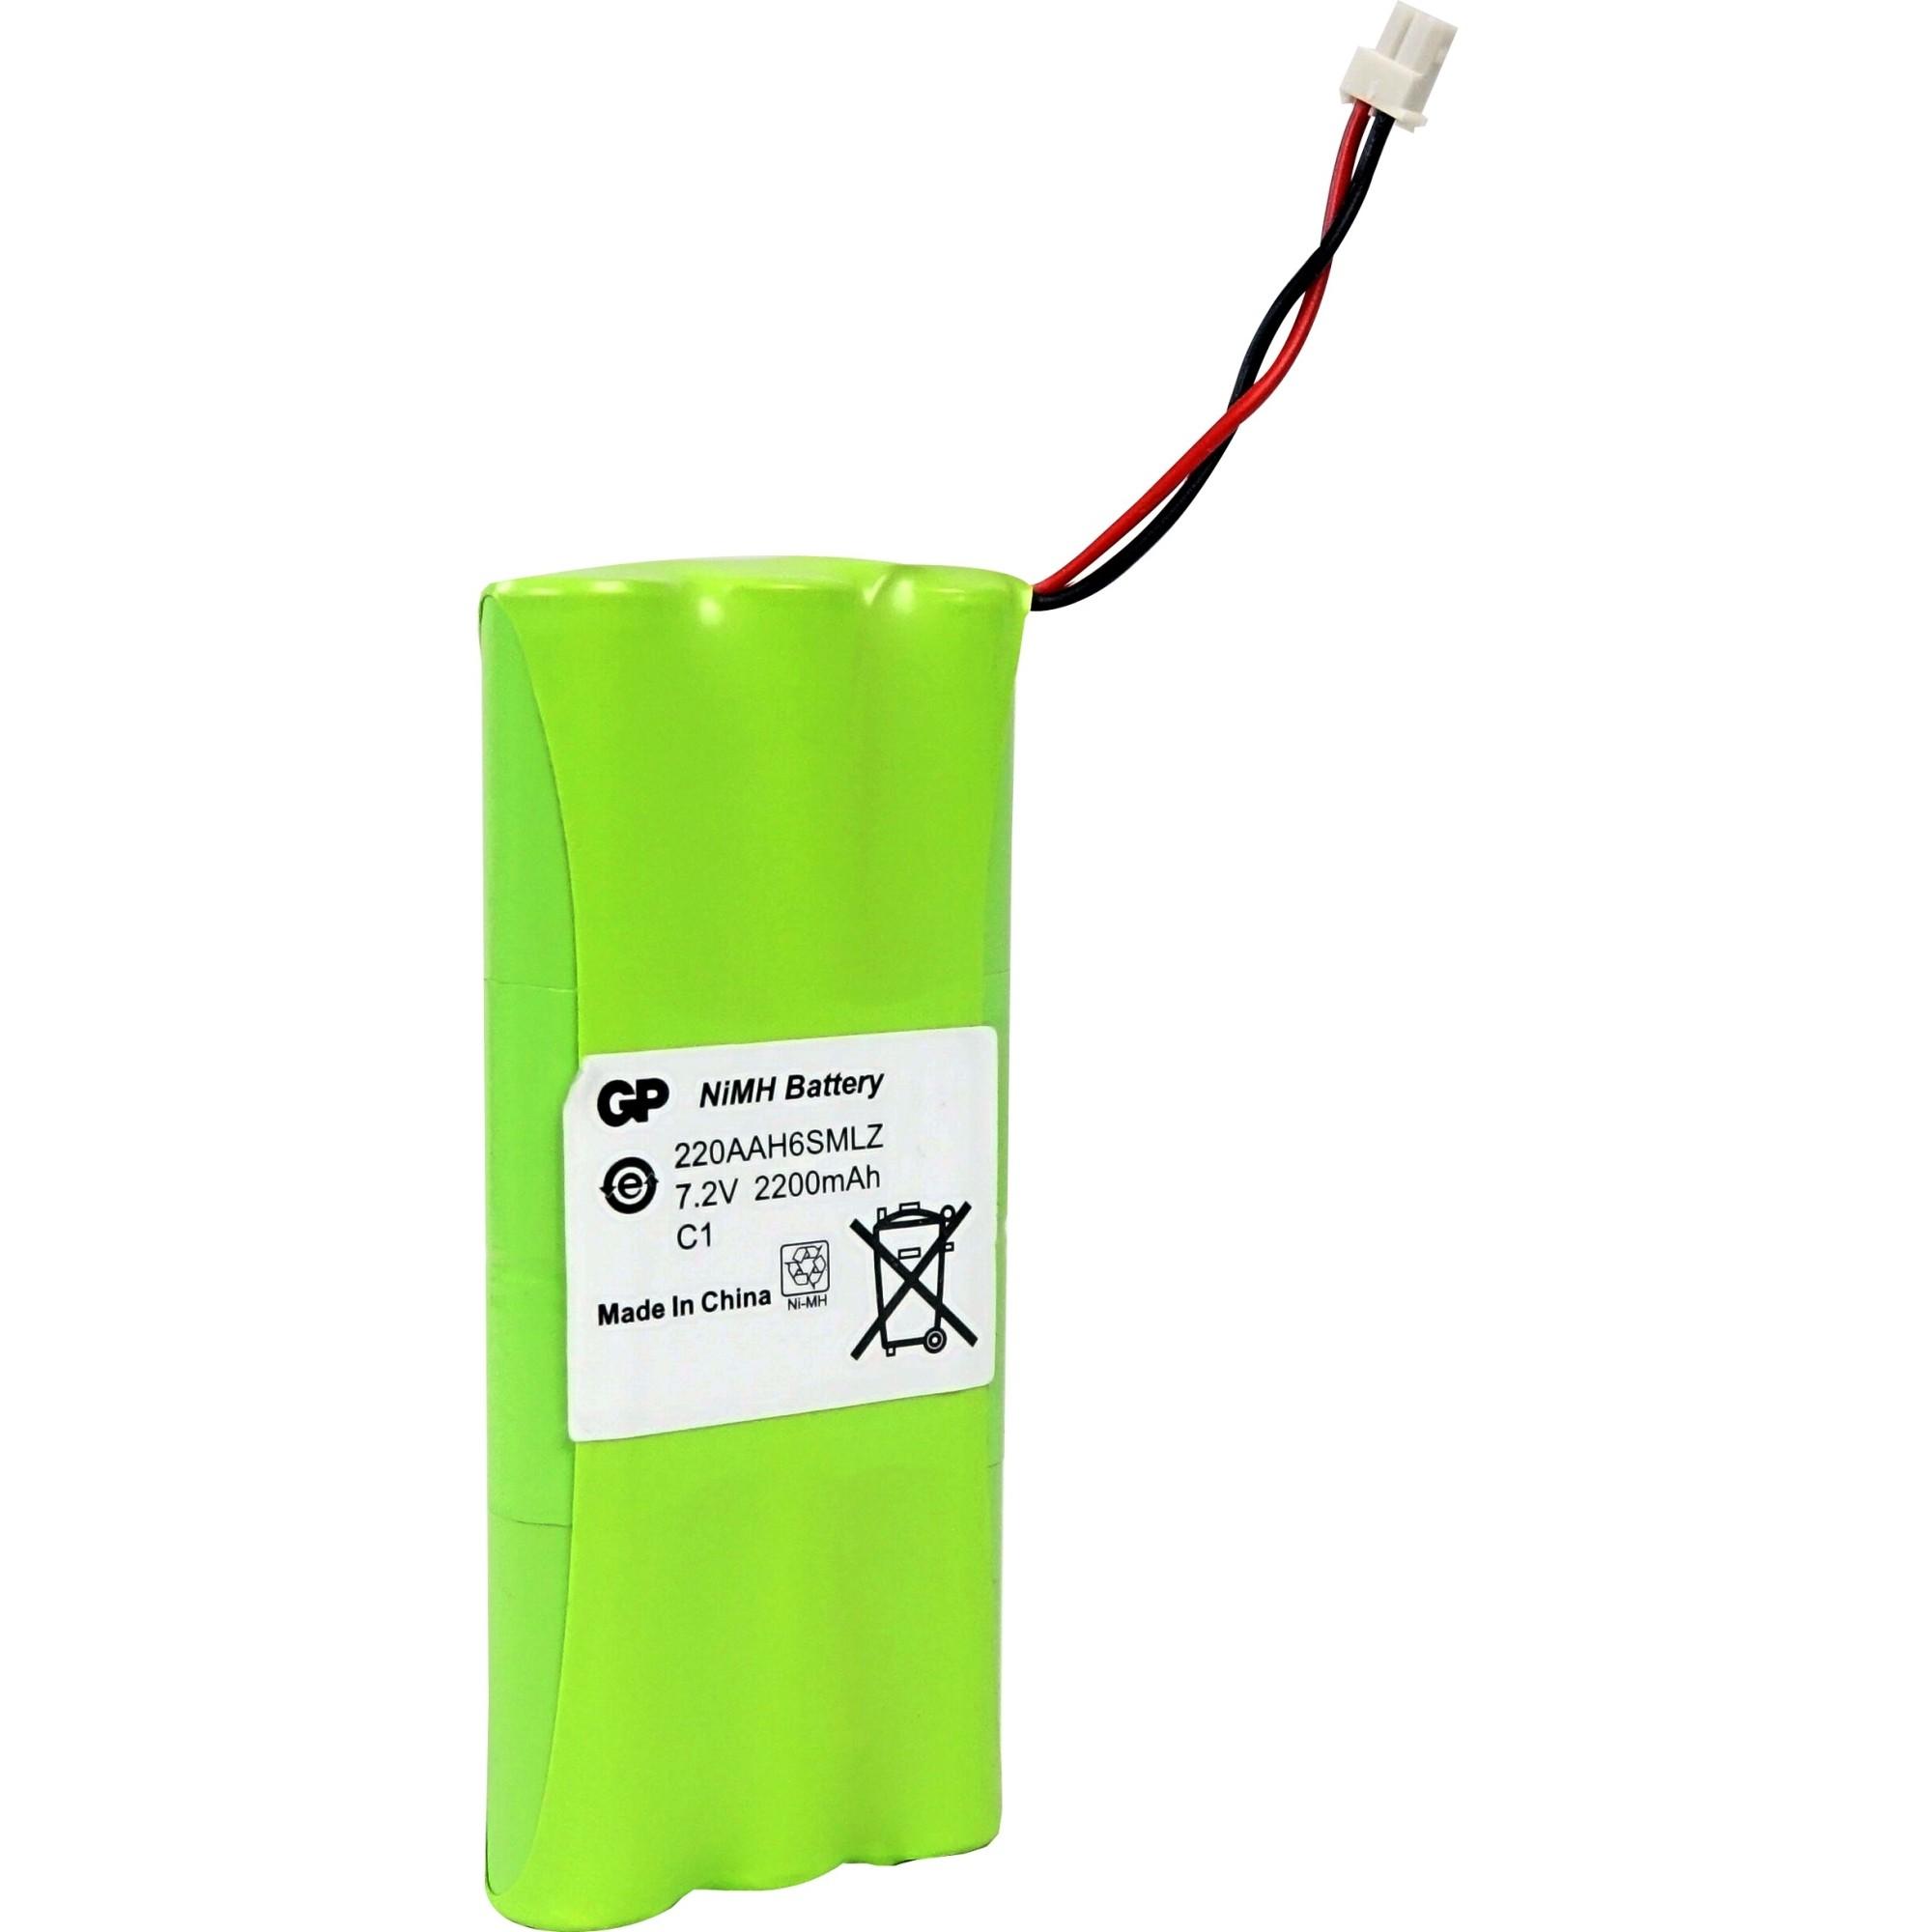 ClearOne Max Wireless Battery 7.2/2200Mah